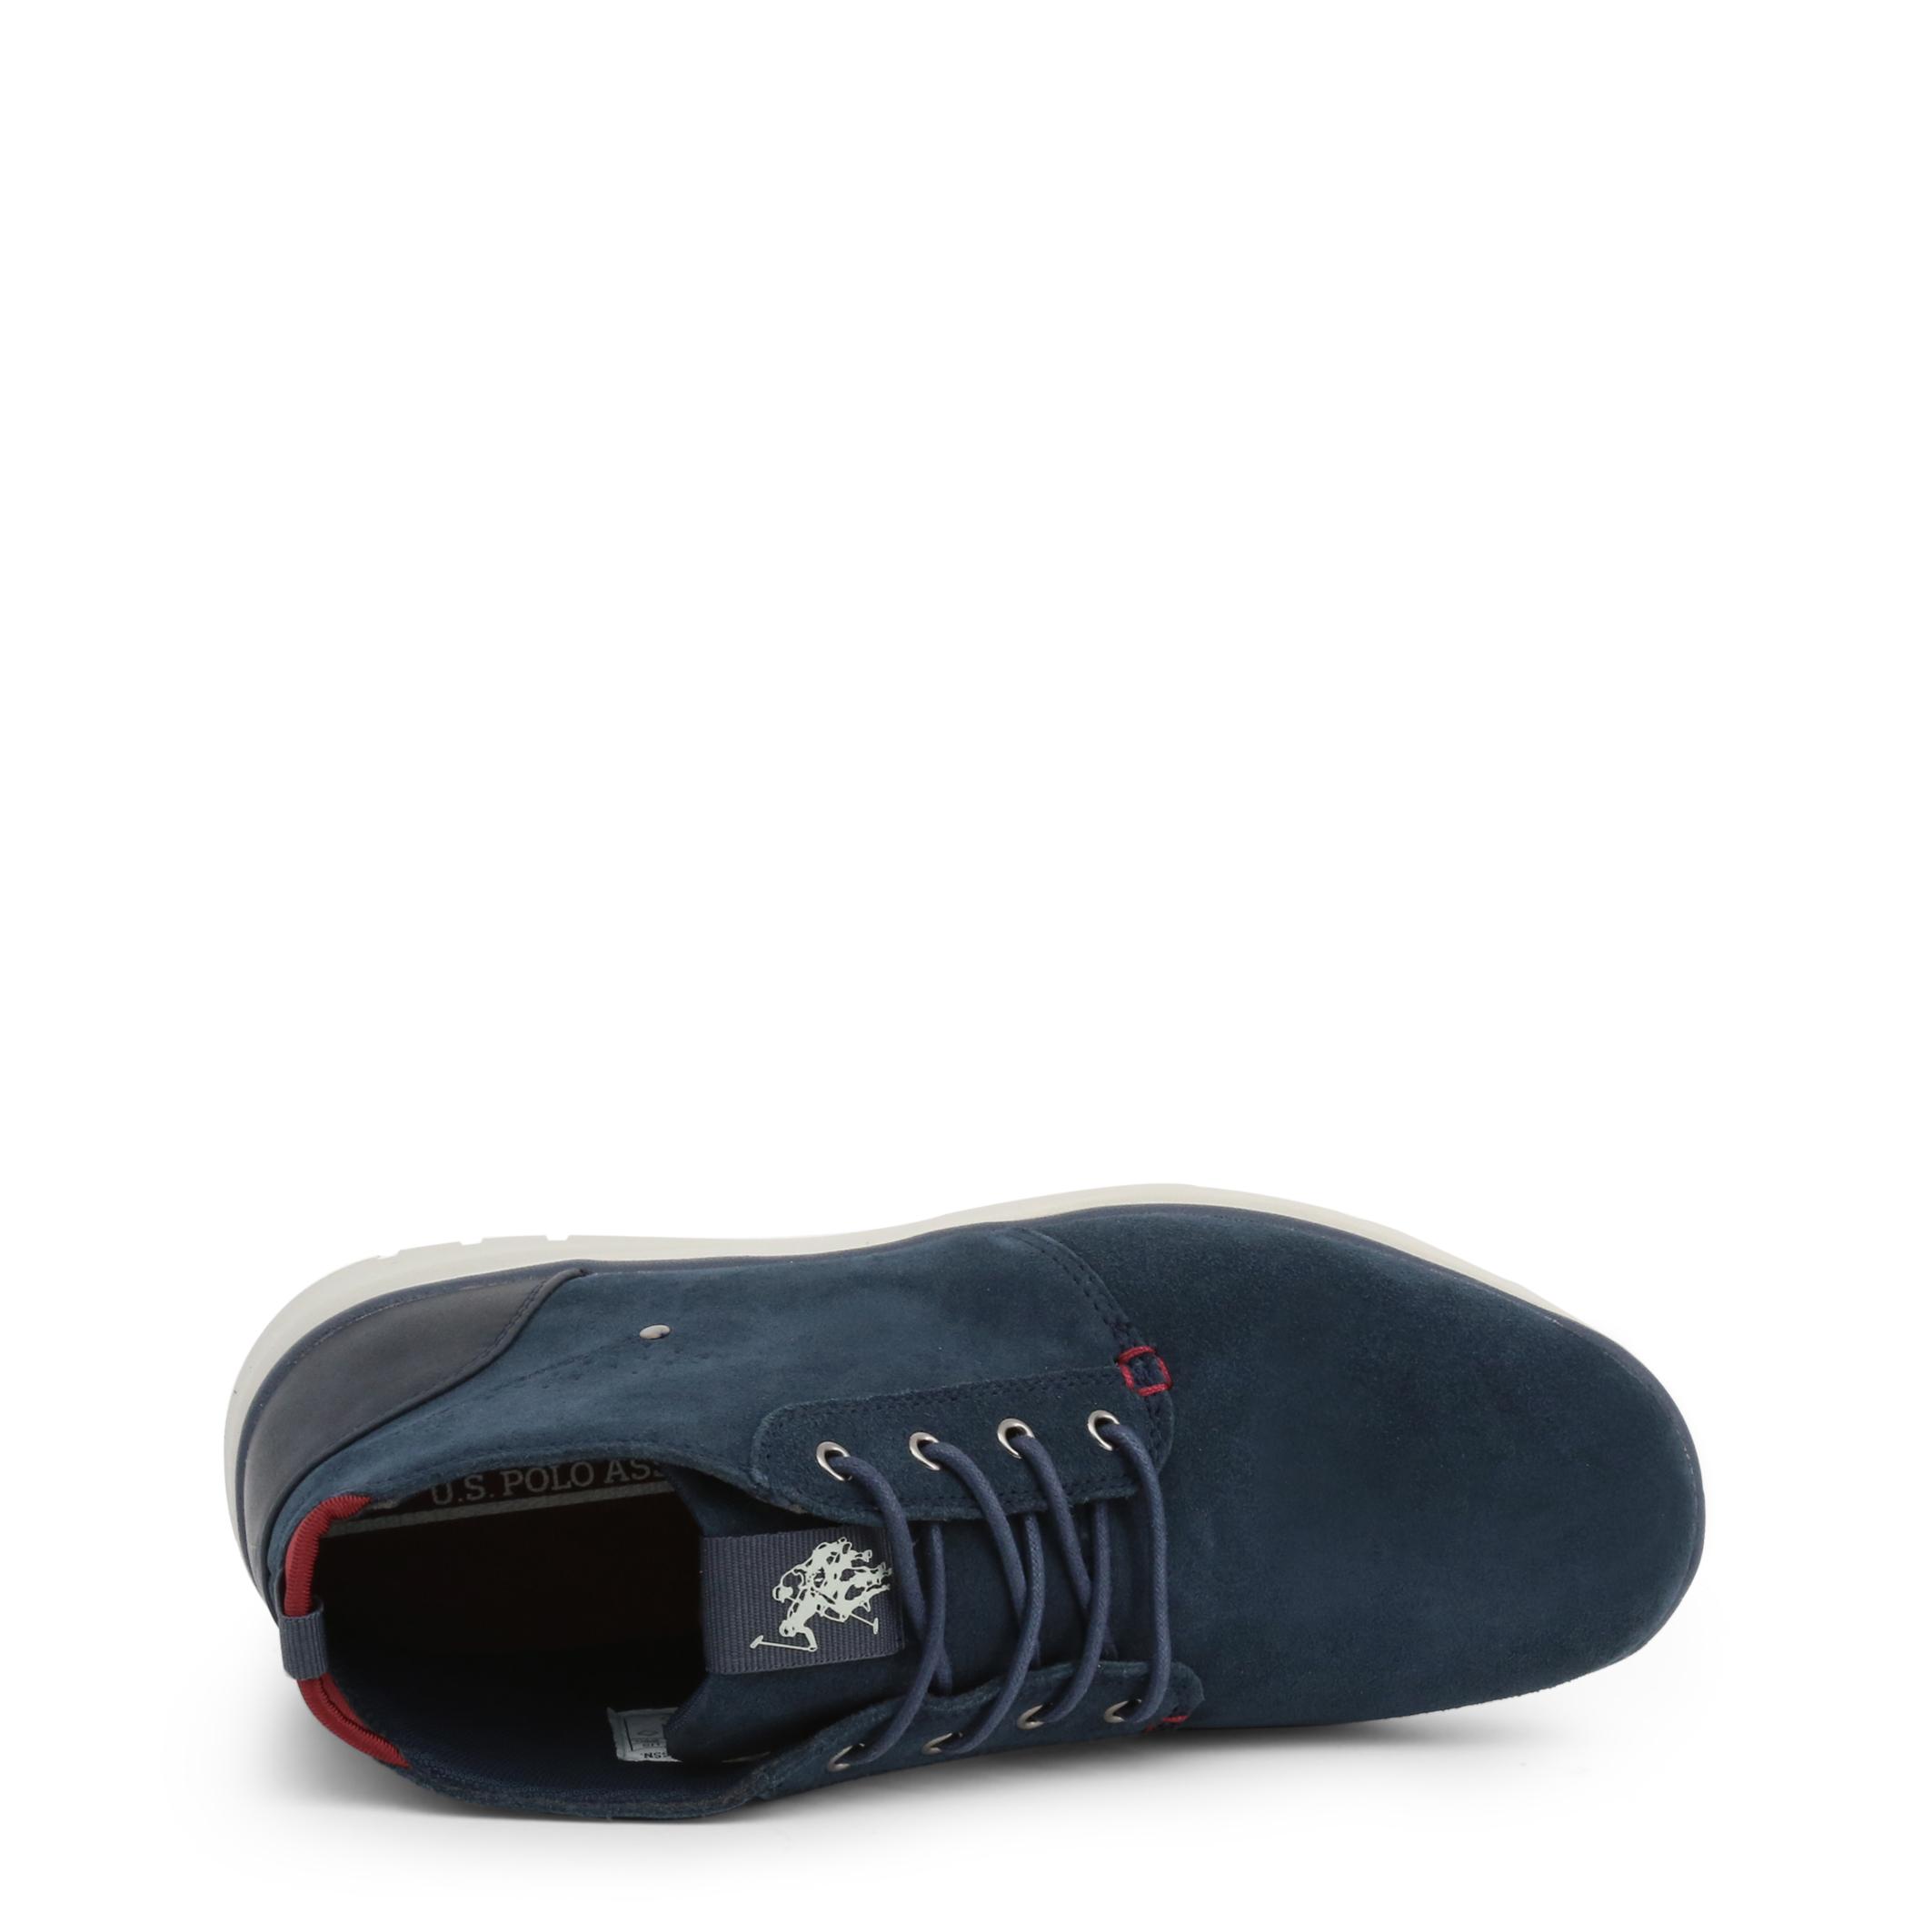 Chaussures de ville  U.S. Polo Assn. YGOR4128W9_SY1_DKBL blue